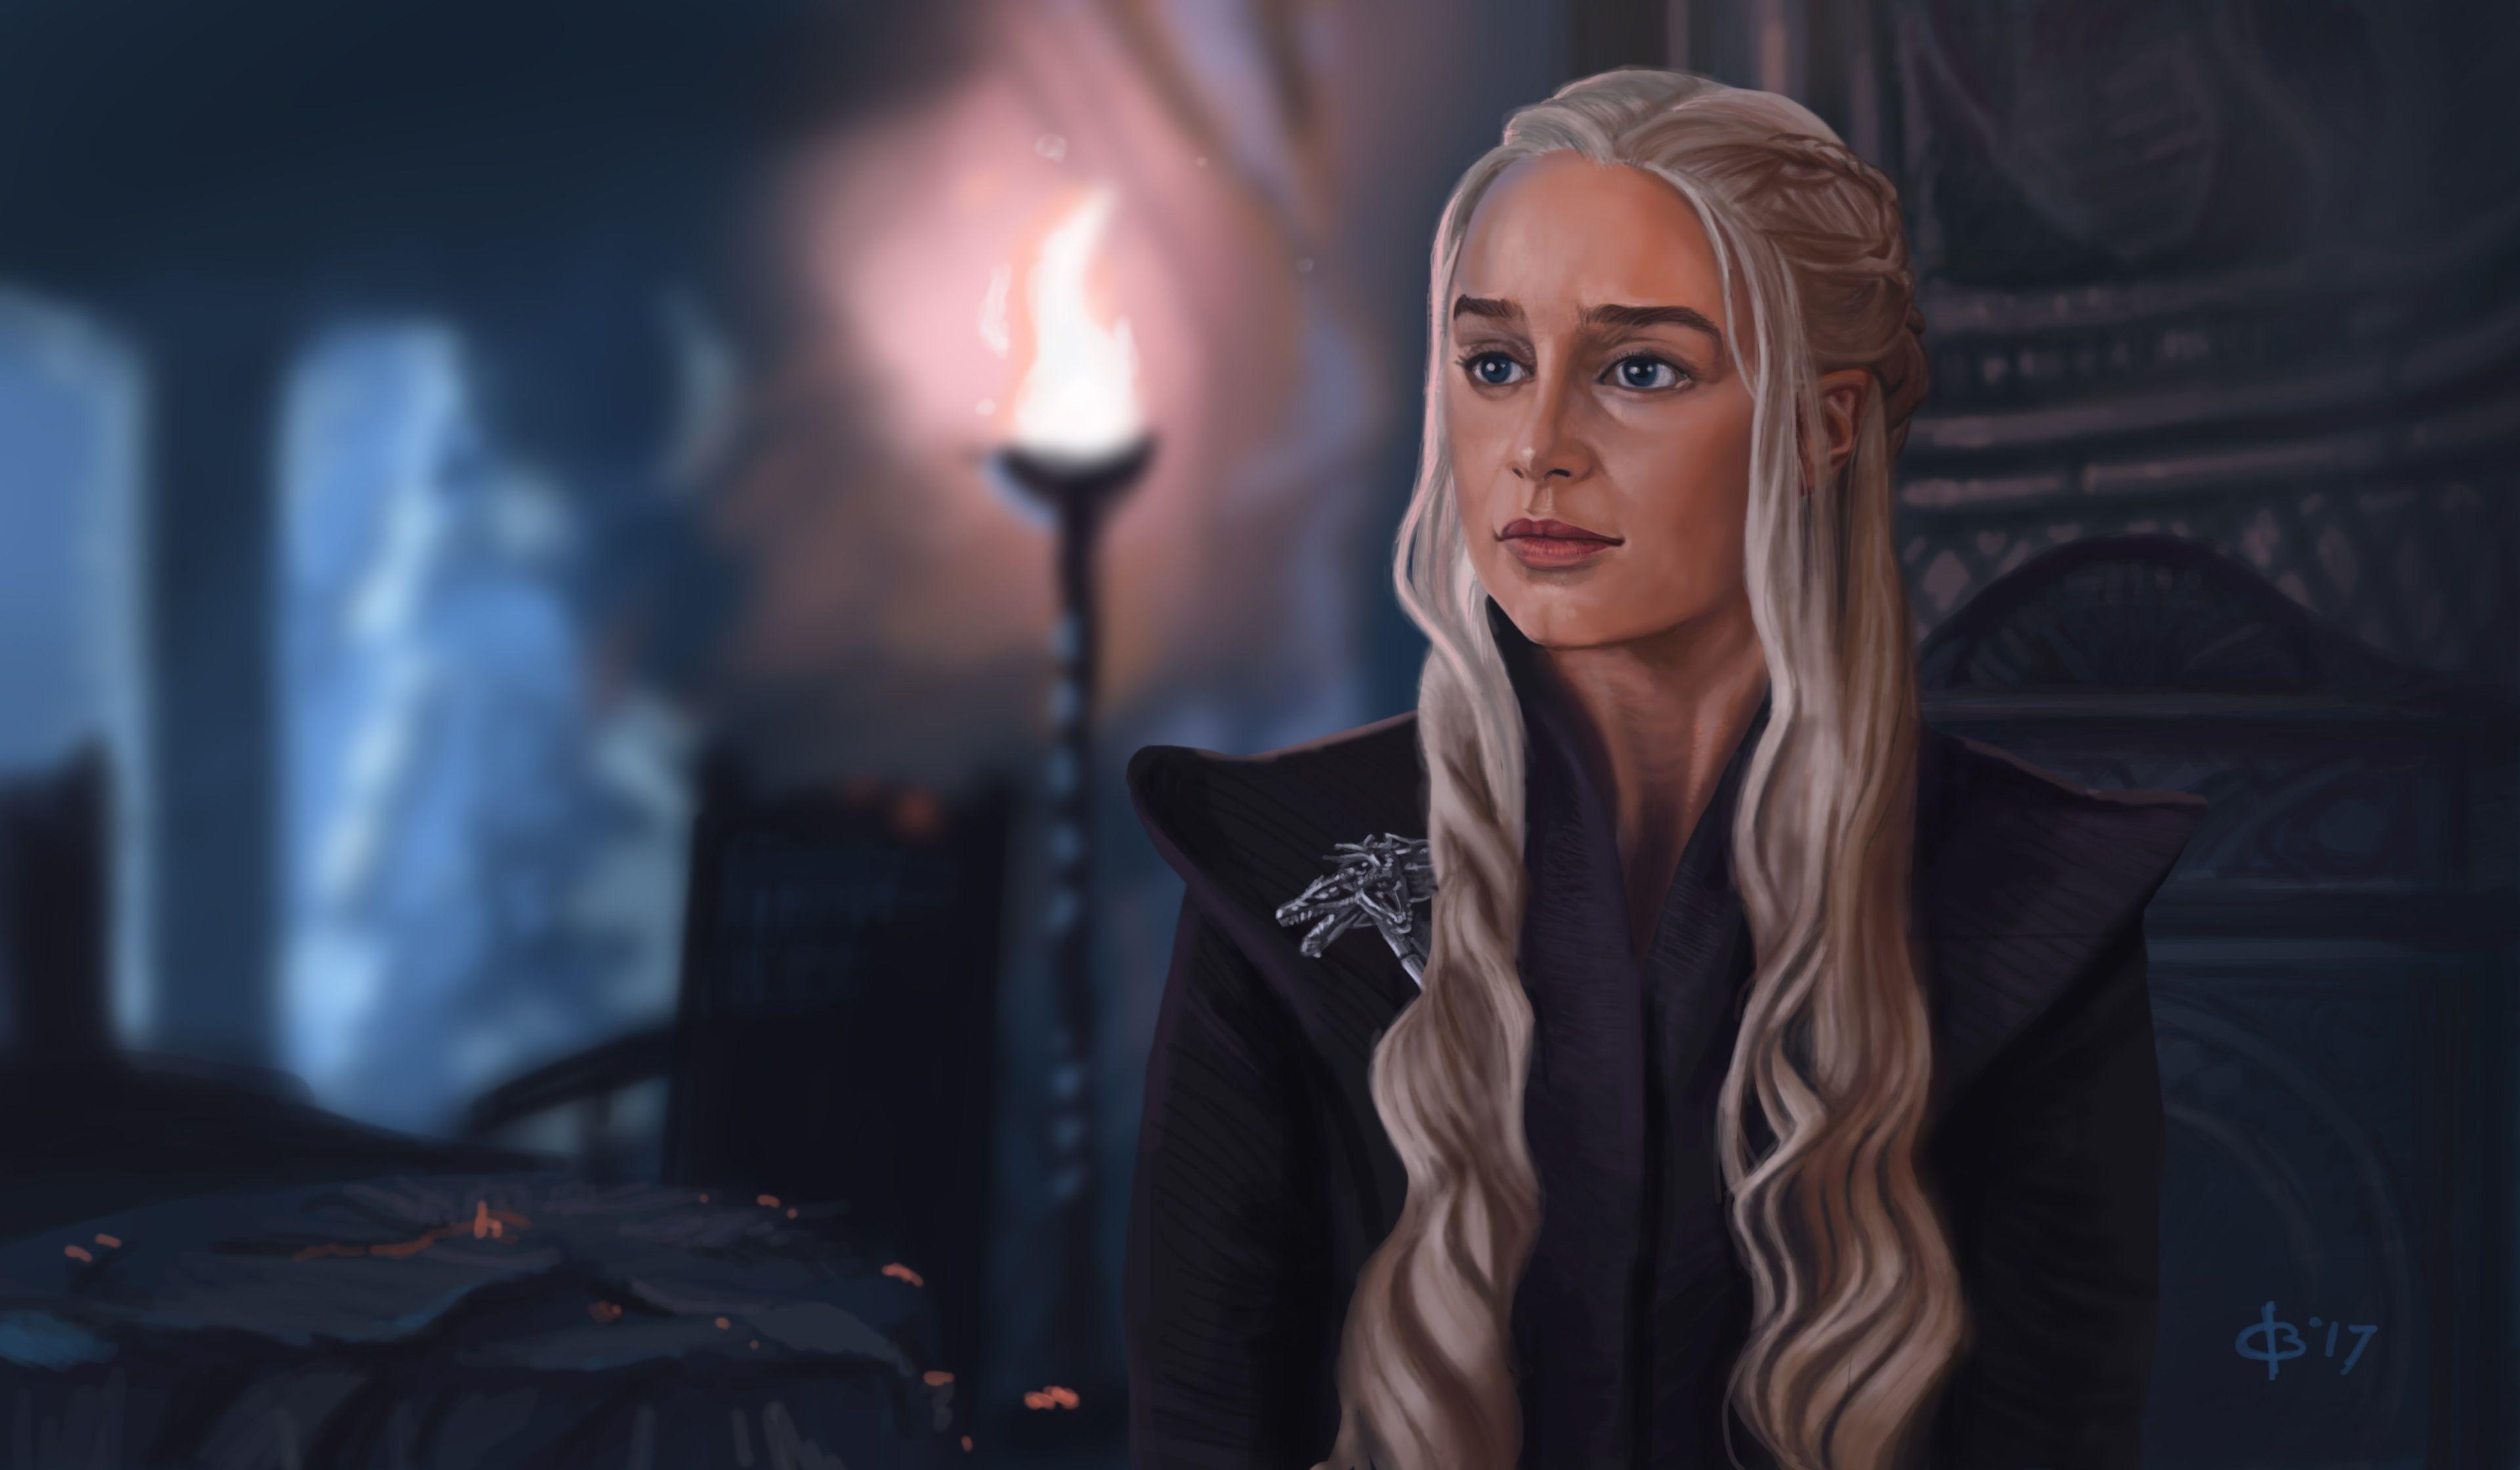 3840x2240 Daenerys Targaryen 4k Hq Desktop Wallpaper Game Of Thrones Artwork Daenerys Targaryen Background Images Wallpapers